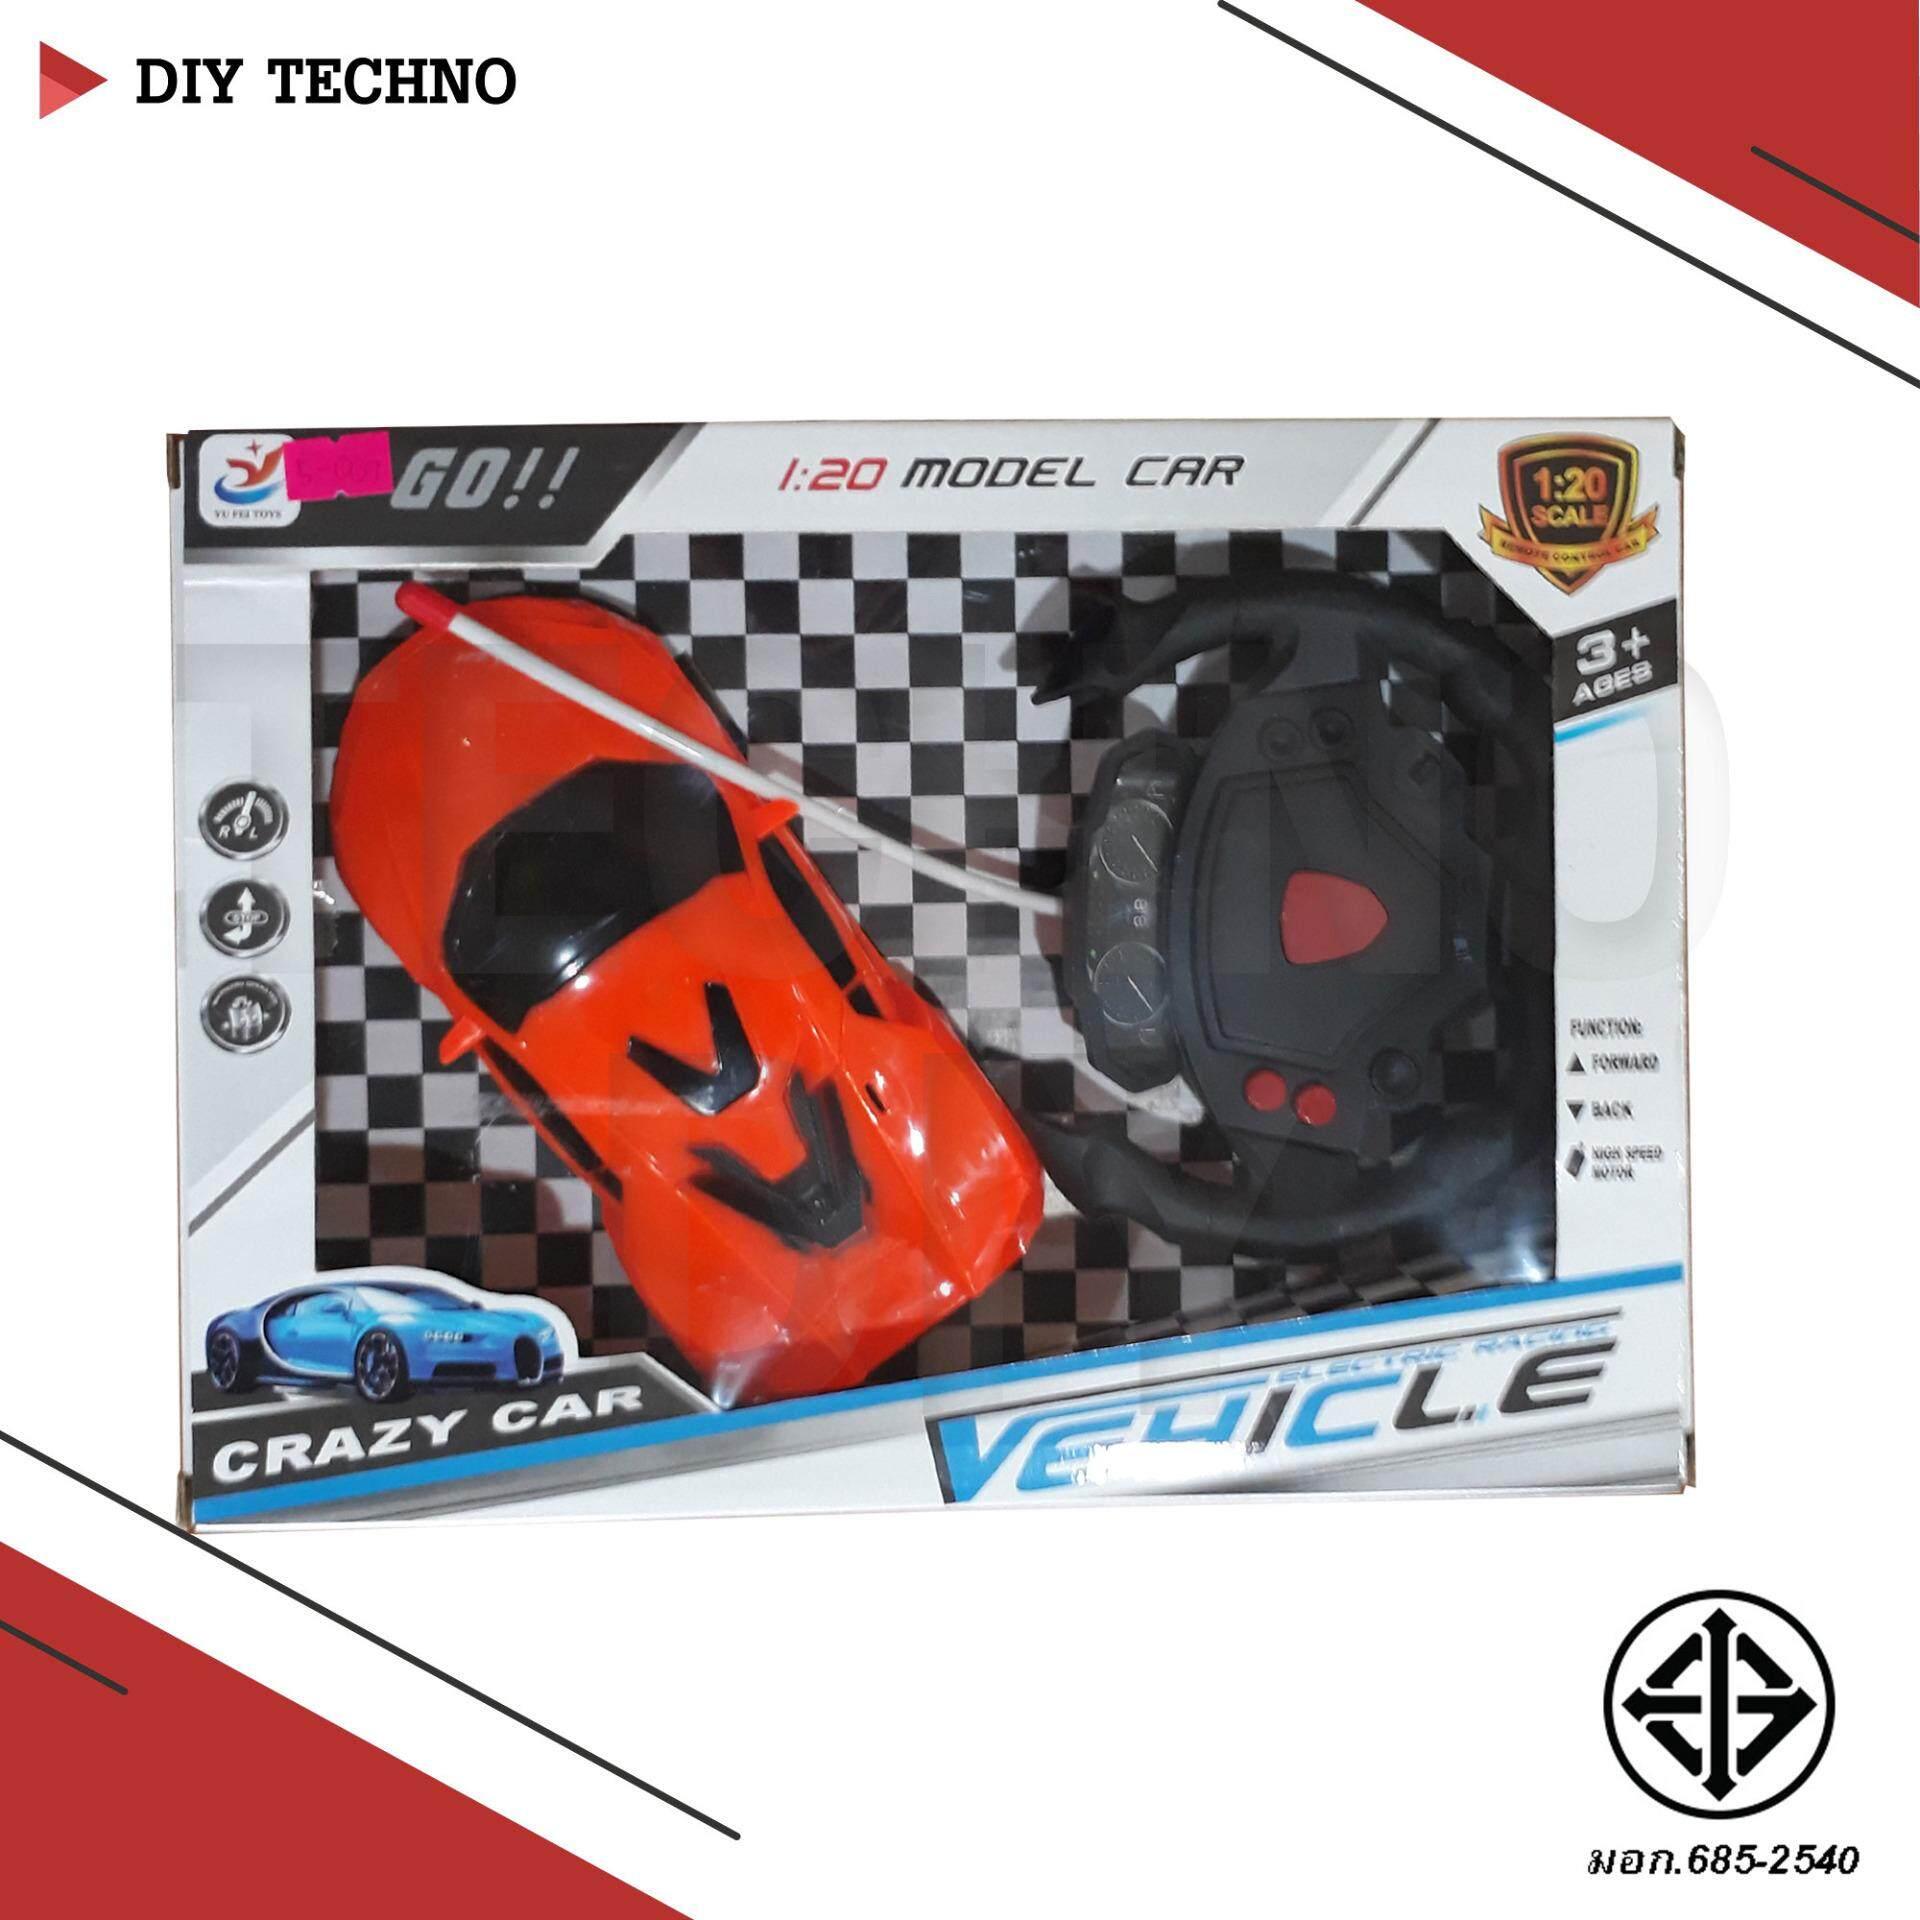 Toys 5007o รถสปอร์ต บังคับ สีส้ม Crazy Car มี รีโมทคอนโทรล วัสดุปลอดภัย มี มอก. ของเล่น Venicle Electric Racing สร้างเสริมจินตนาการ The Best Gifts For Children Funny Toy Knead Your Interesting Childhood Its A Magical World Lets Play Together By Diytechno.